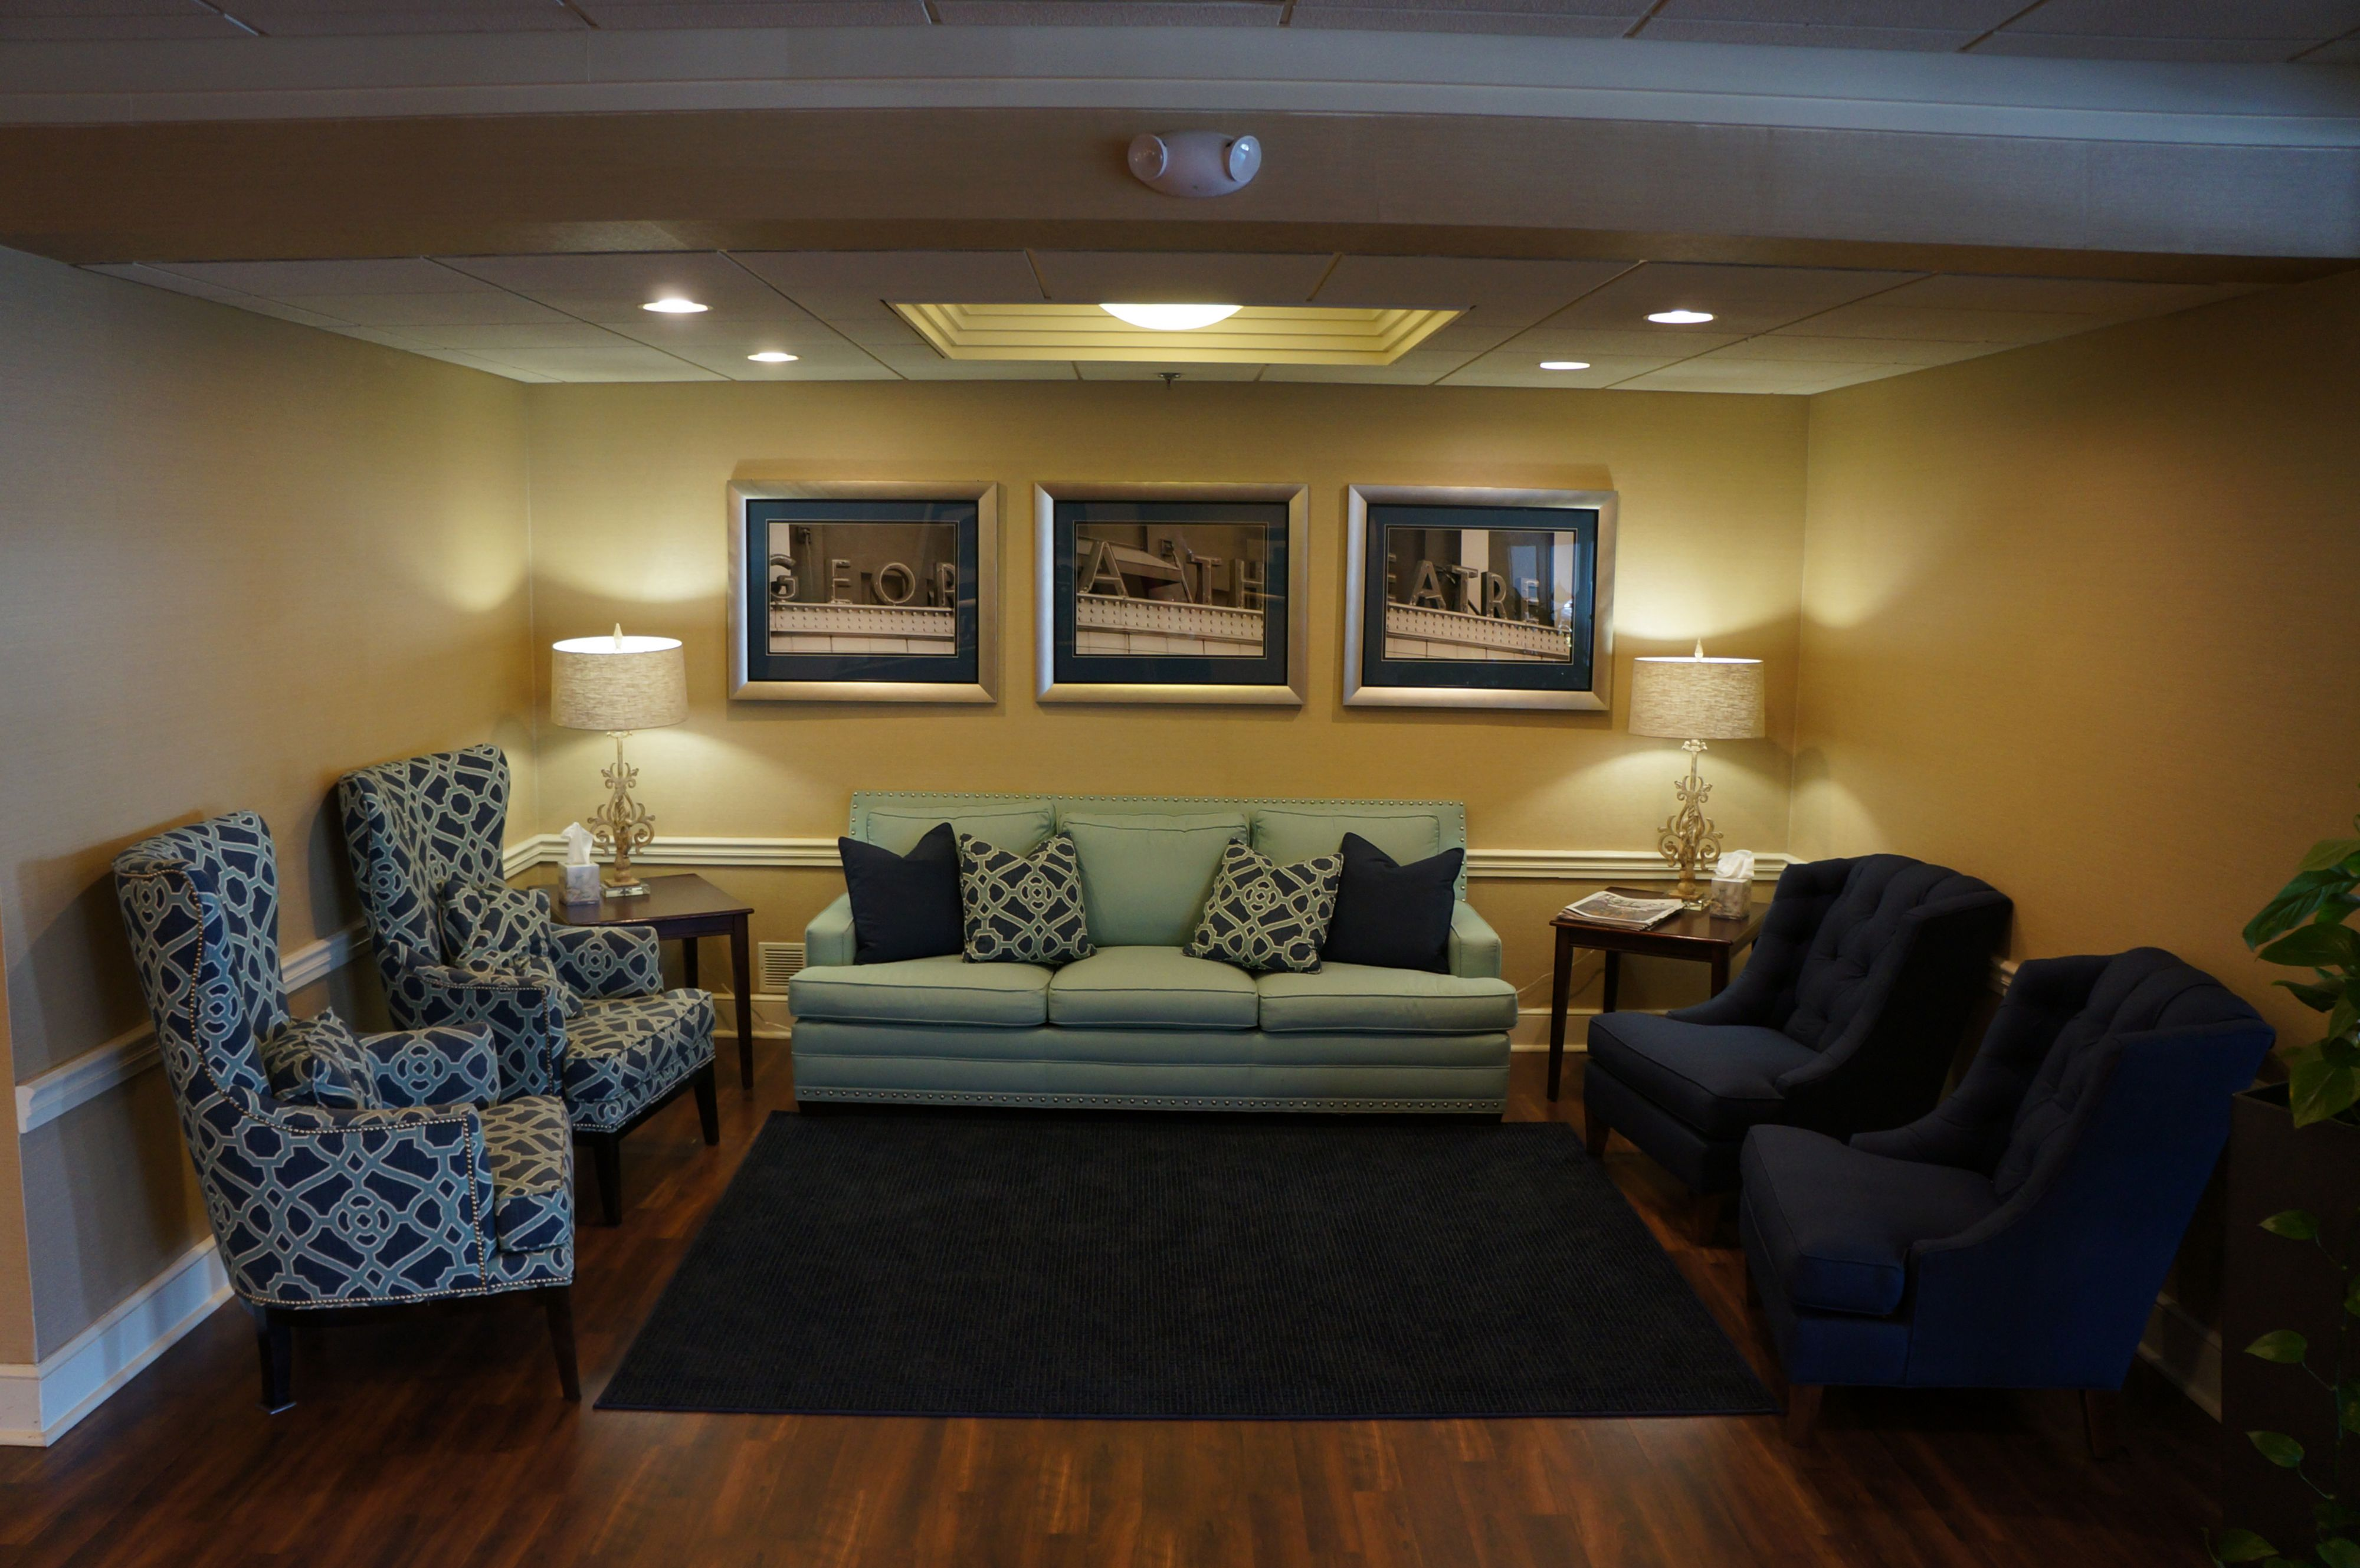 Holiday Inn Athens-University Area image 7